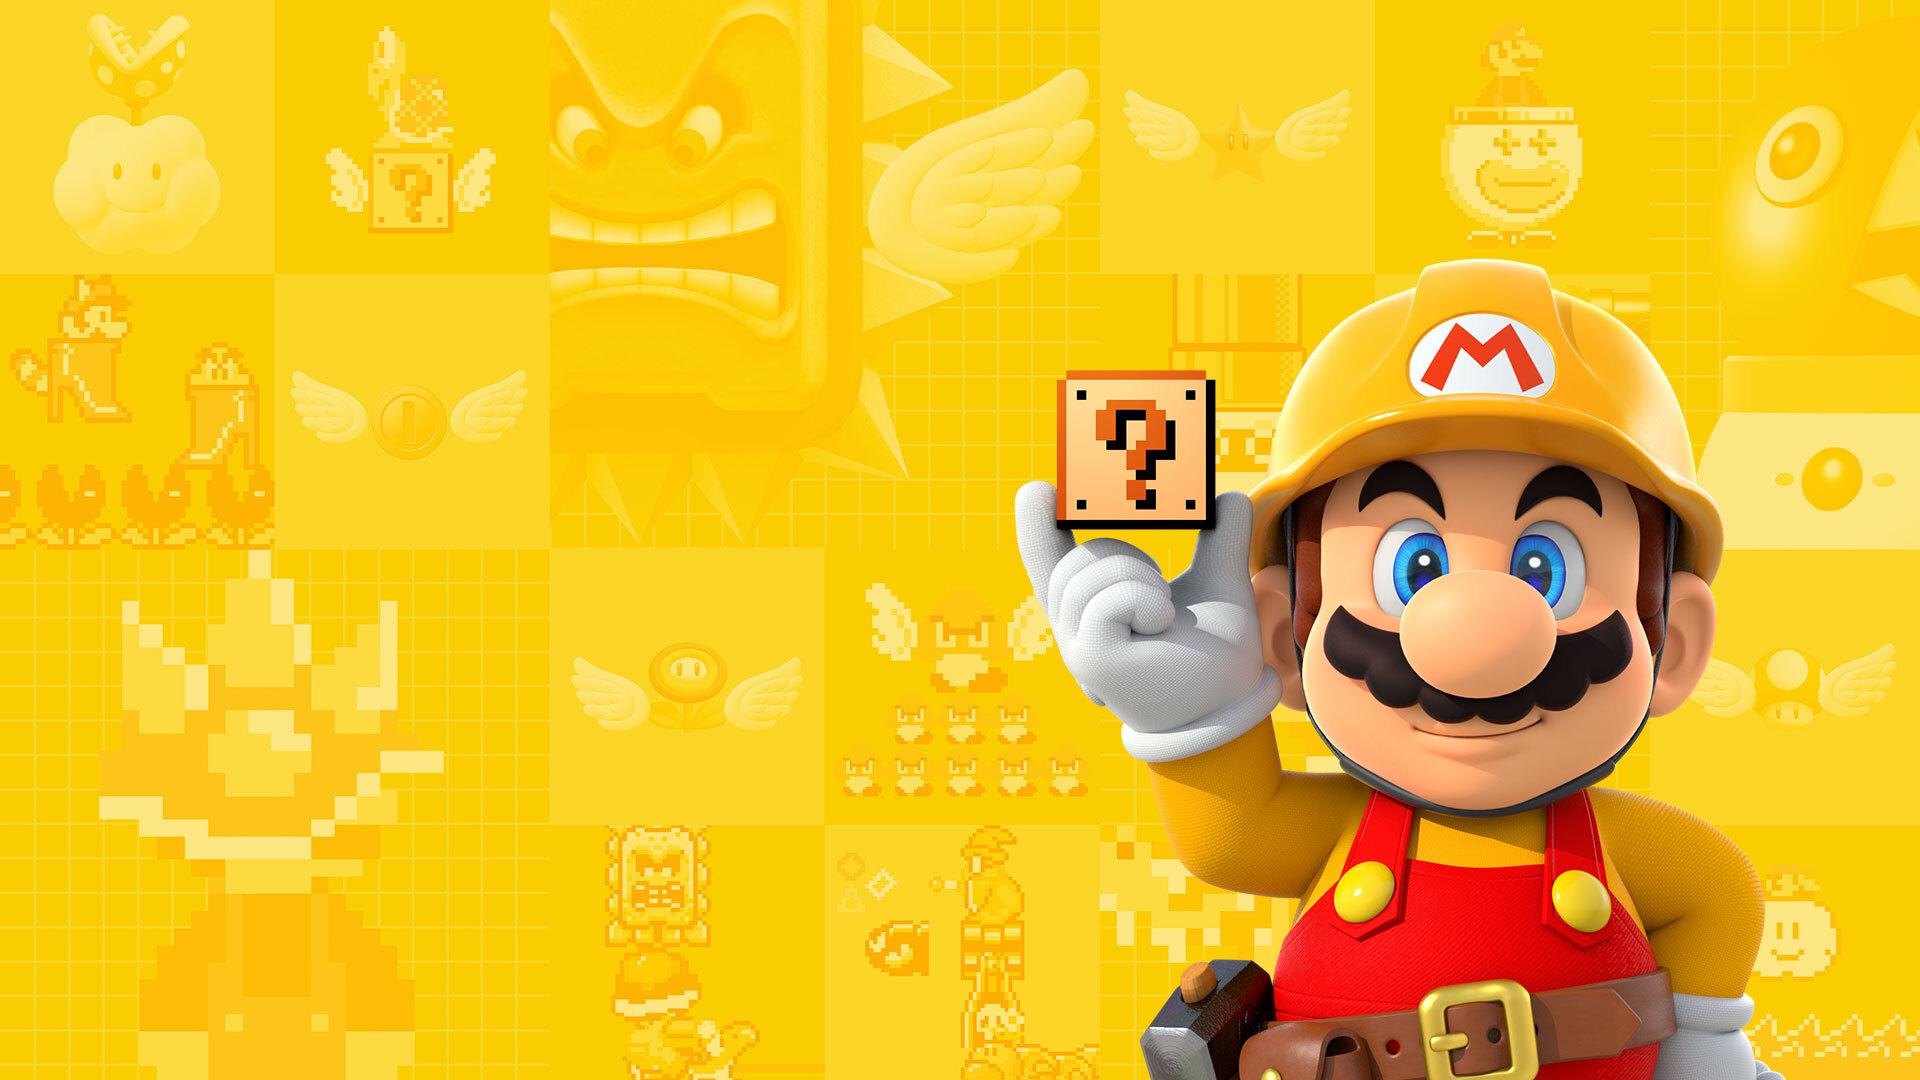 1920x1080 Super Mario Maker Laptop Full Hd 1080p Hd 4k Wallpapers